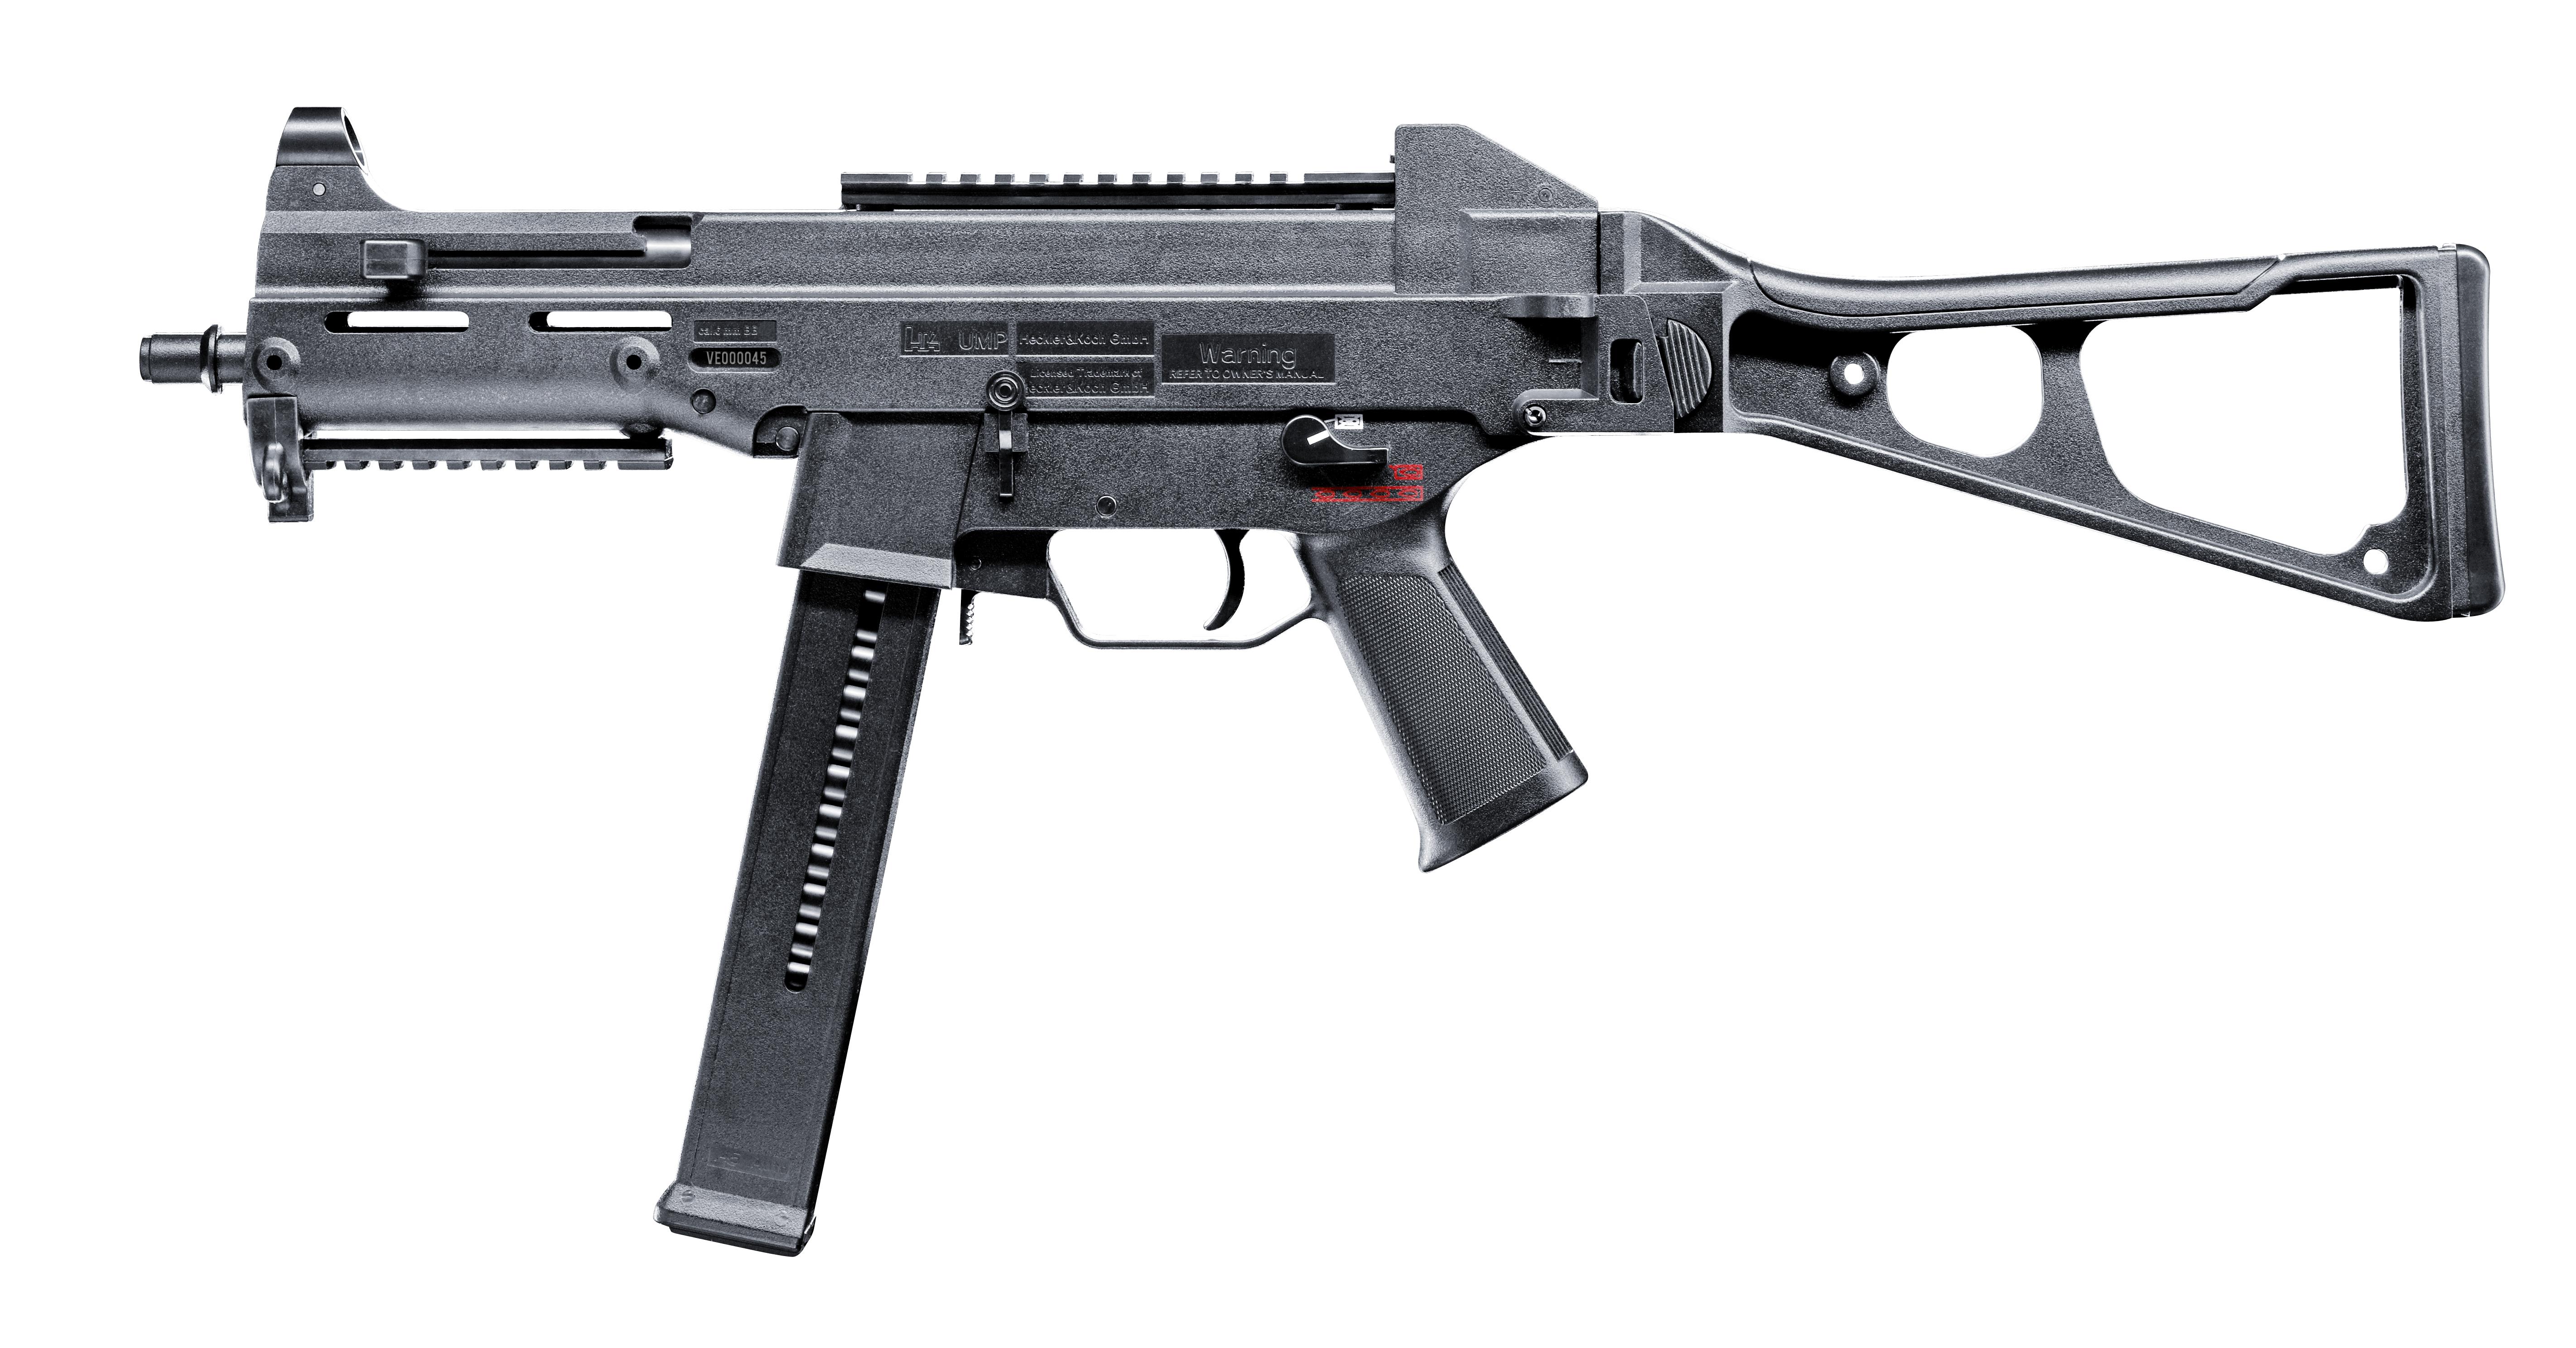 HECKLER & KOCH (Umarex) AEG Rifle UMP Sportsline